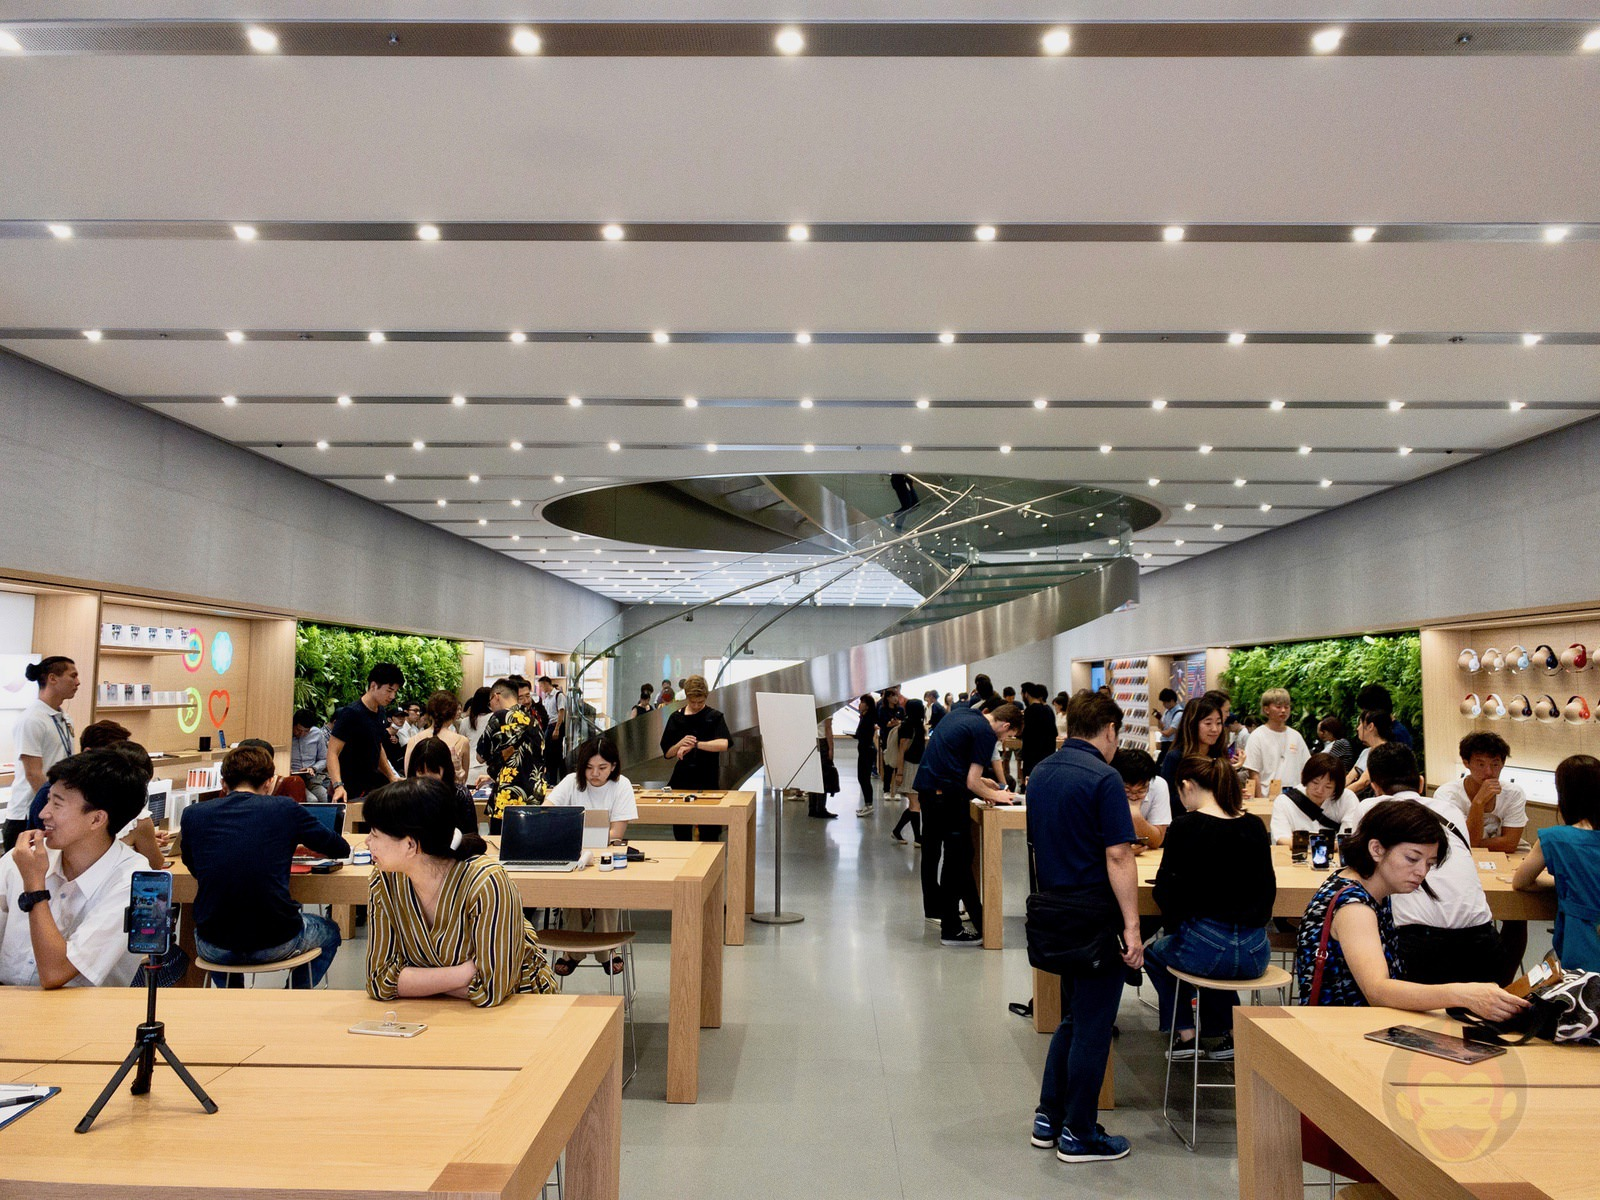 Apple Store Omotesando Basement floor renewal 34